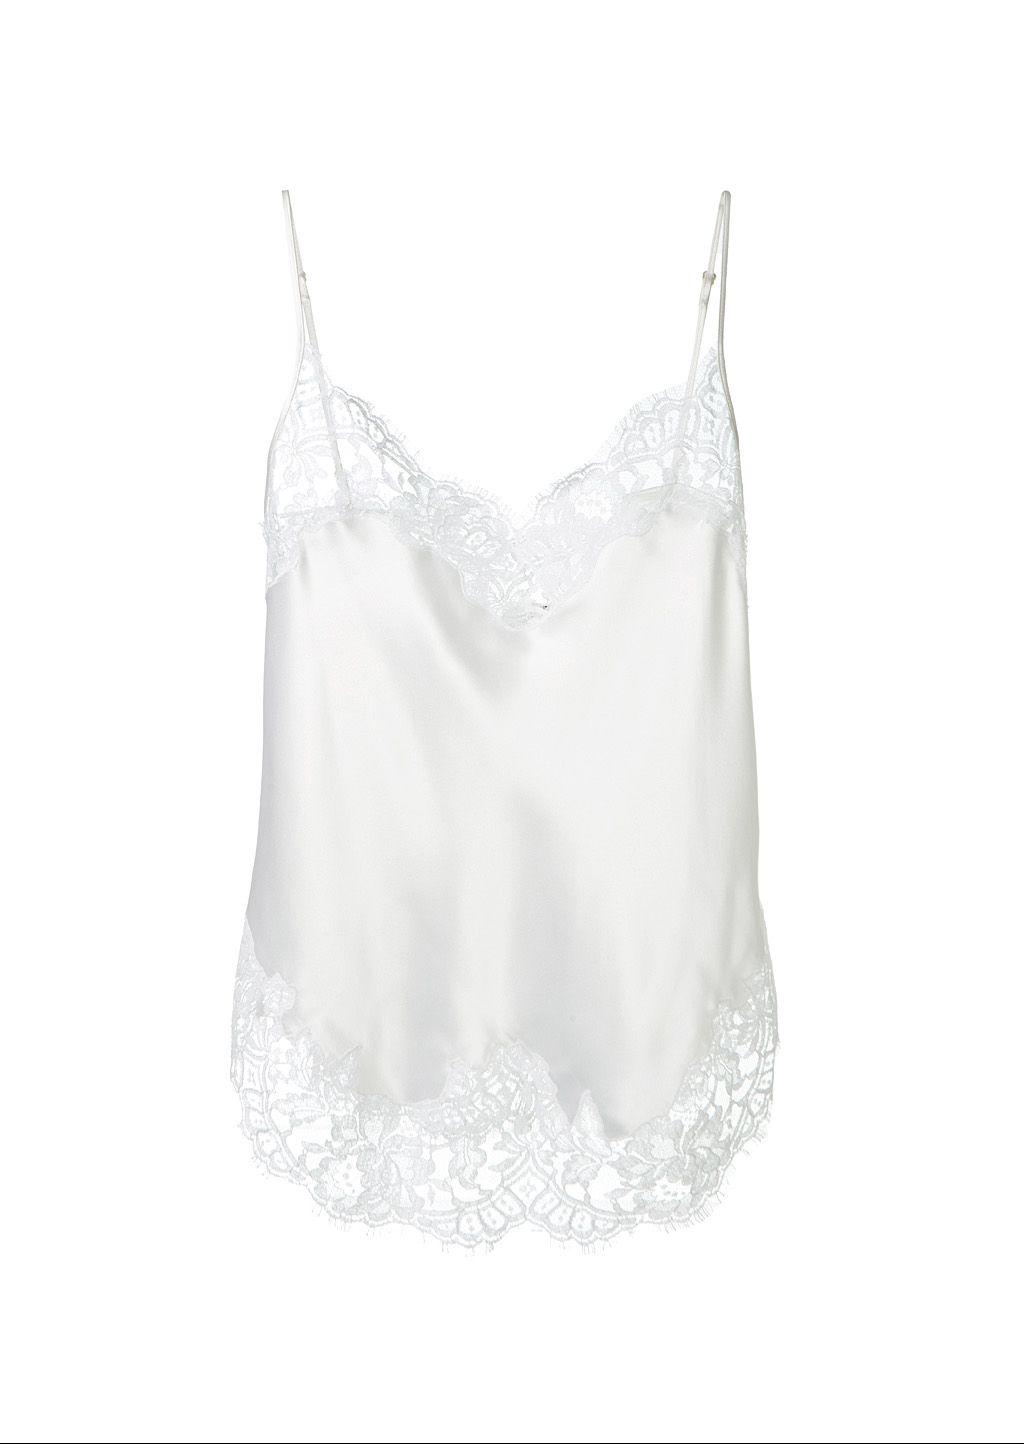 31c7e44166ad8 GIVENCHY Givenchy White Silk Cami.  givenchy  cloth